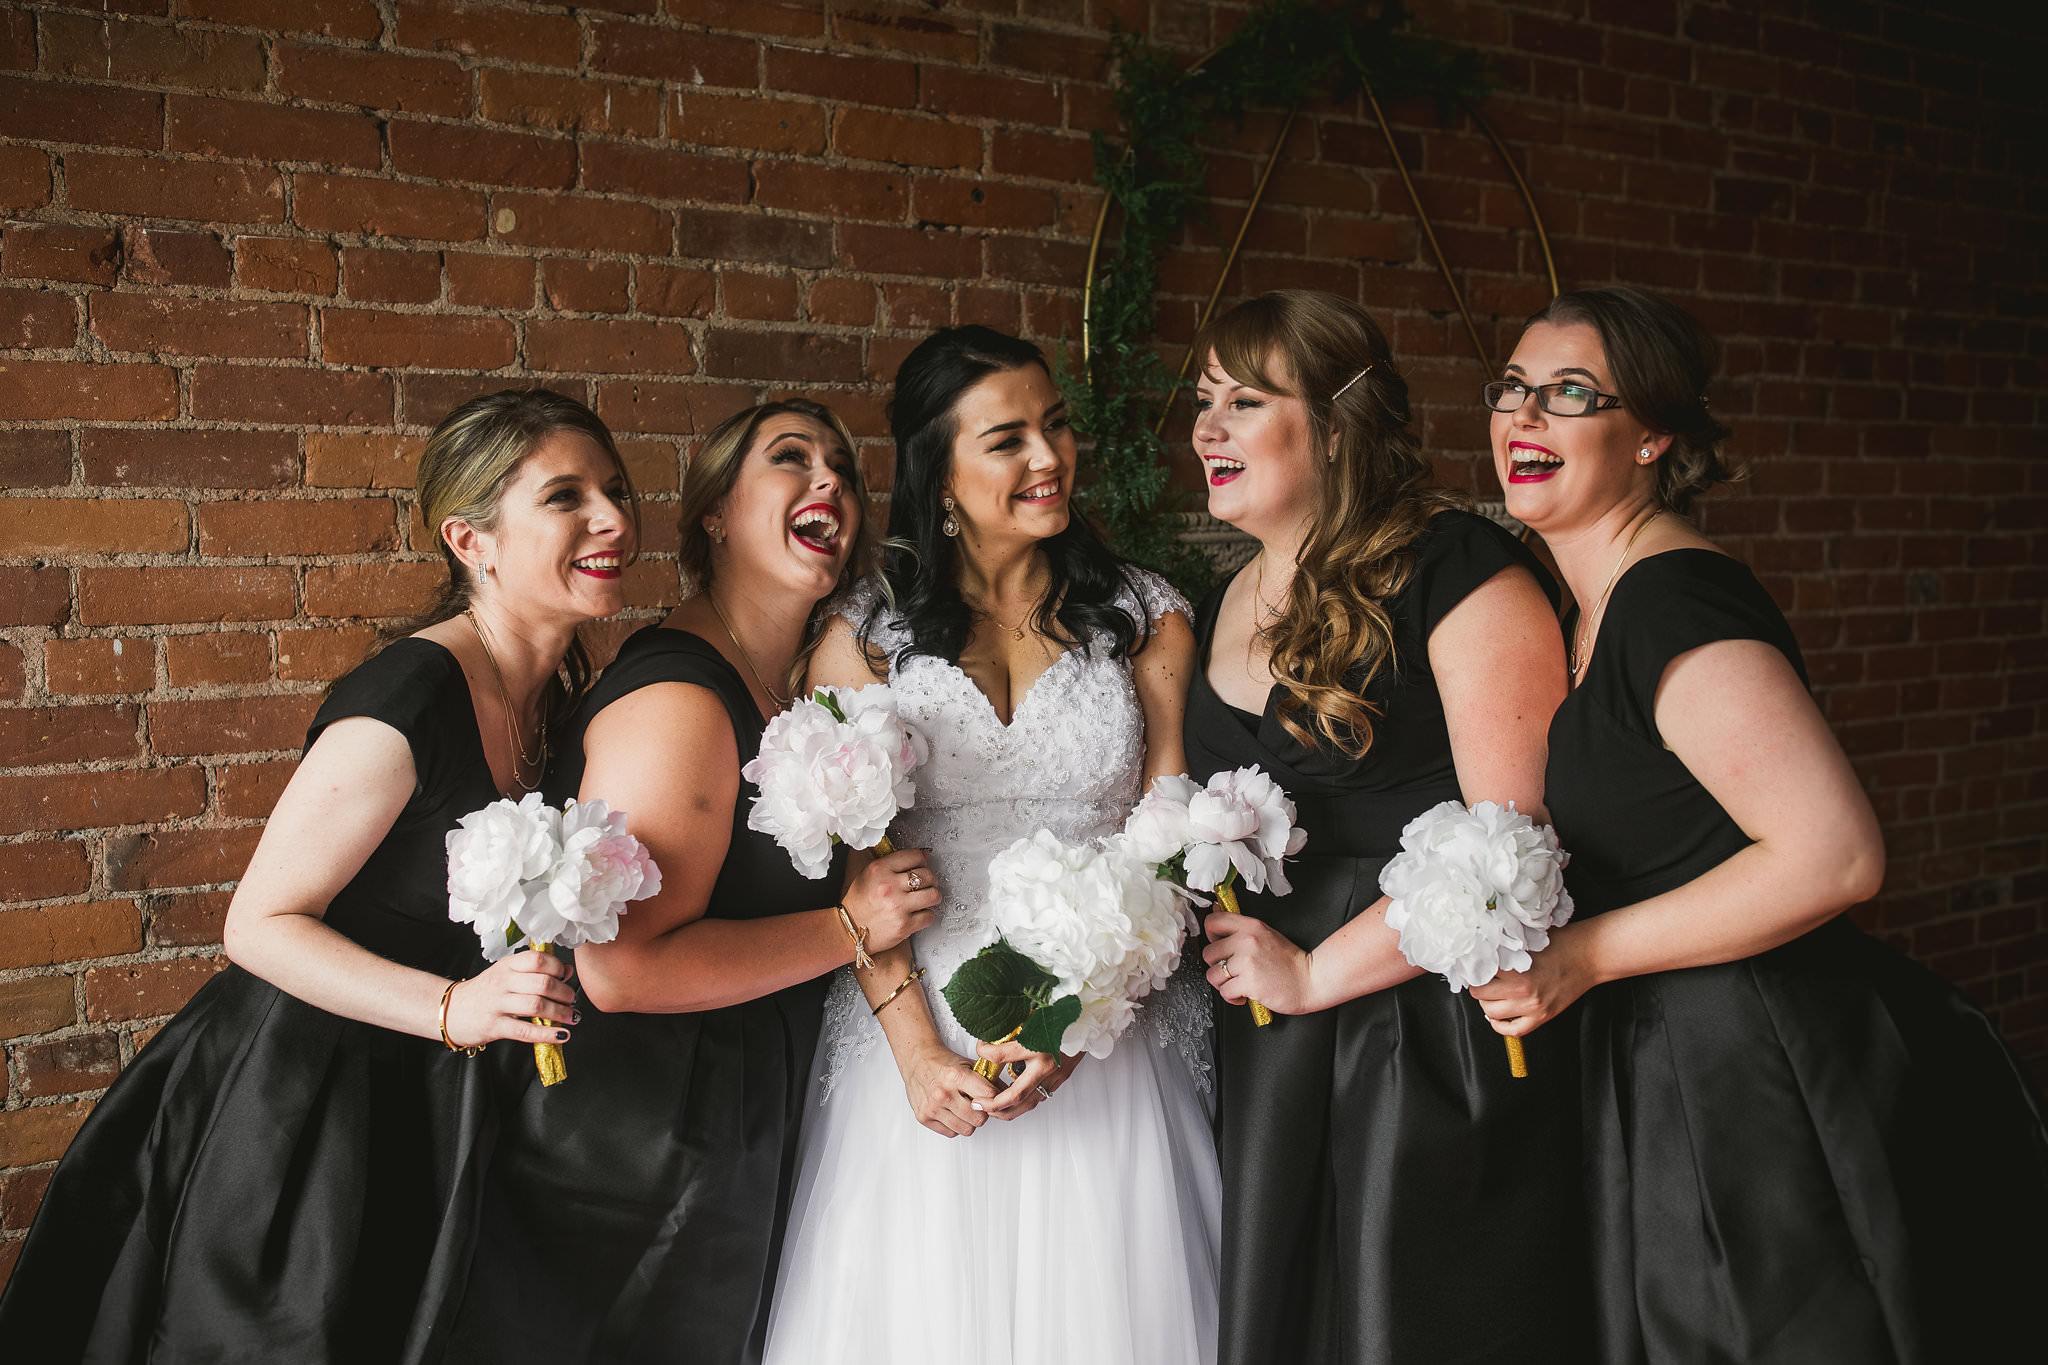 Kristen Adam Kindred Loft Whitby Wedding Photos 220 - Durham Wedding Photographer: Kindred Loft Wedding Photos